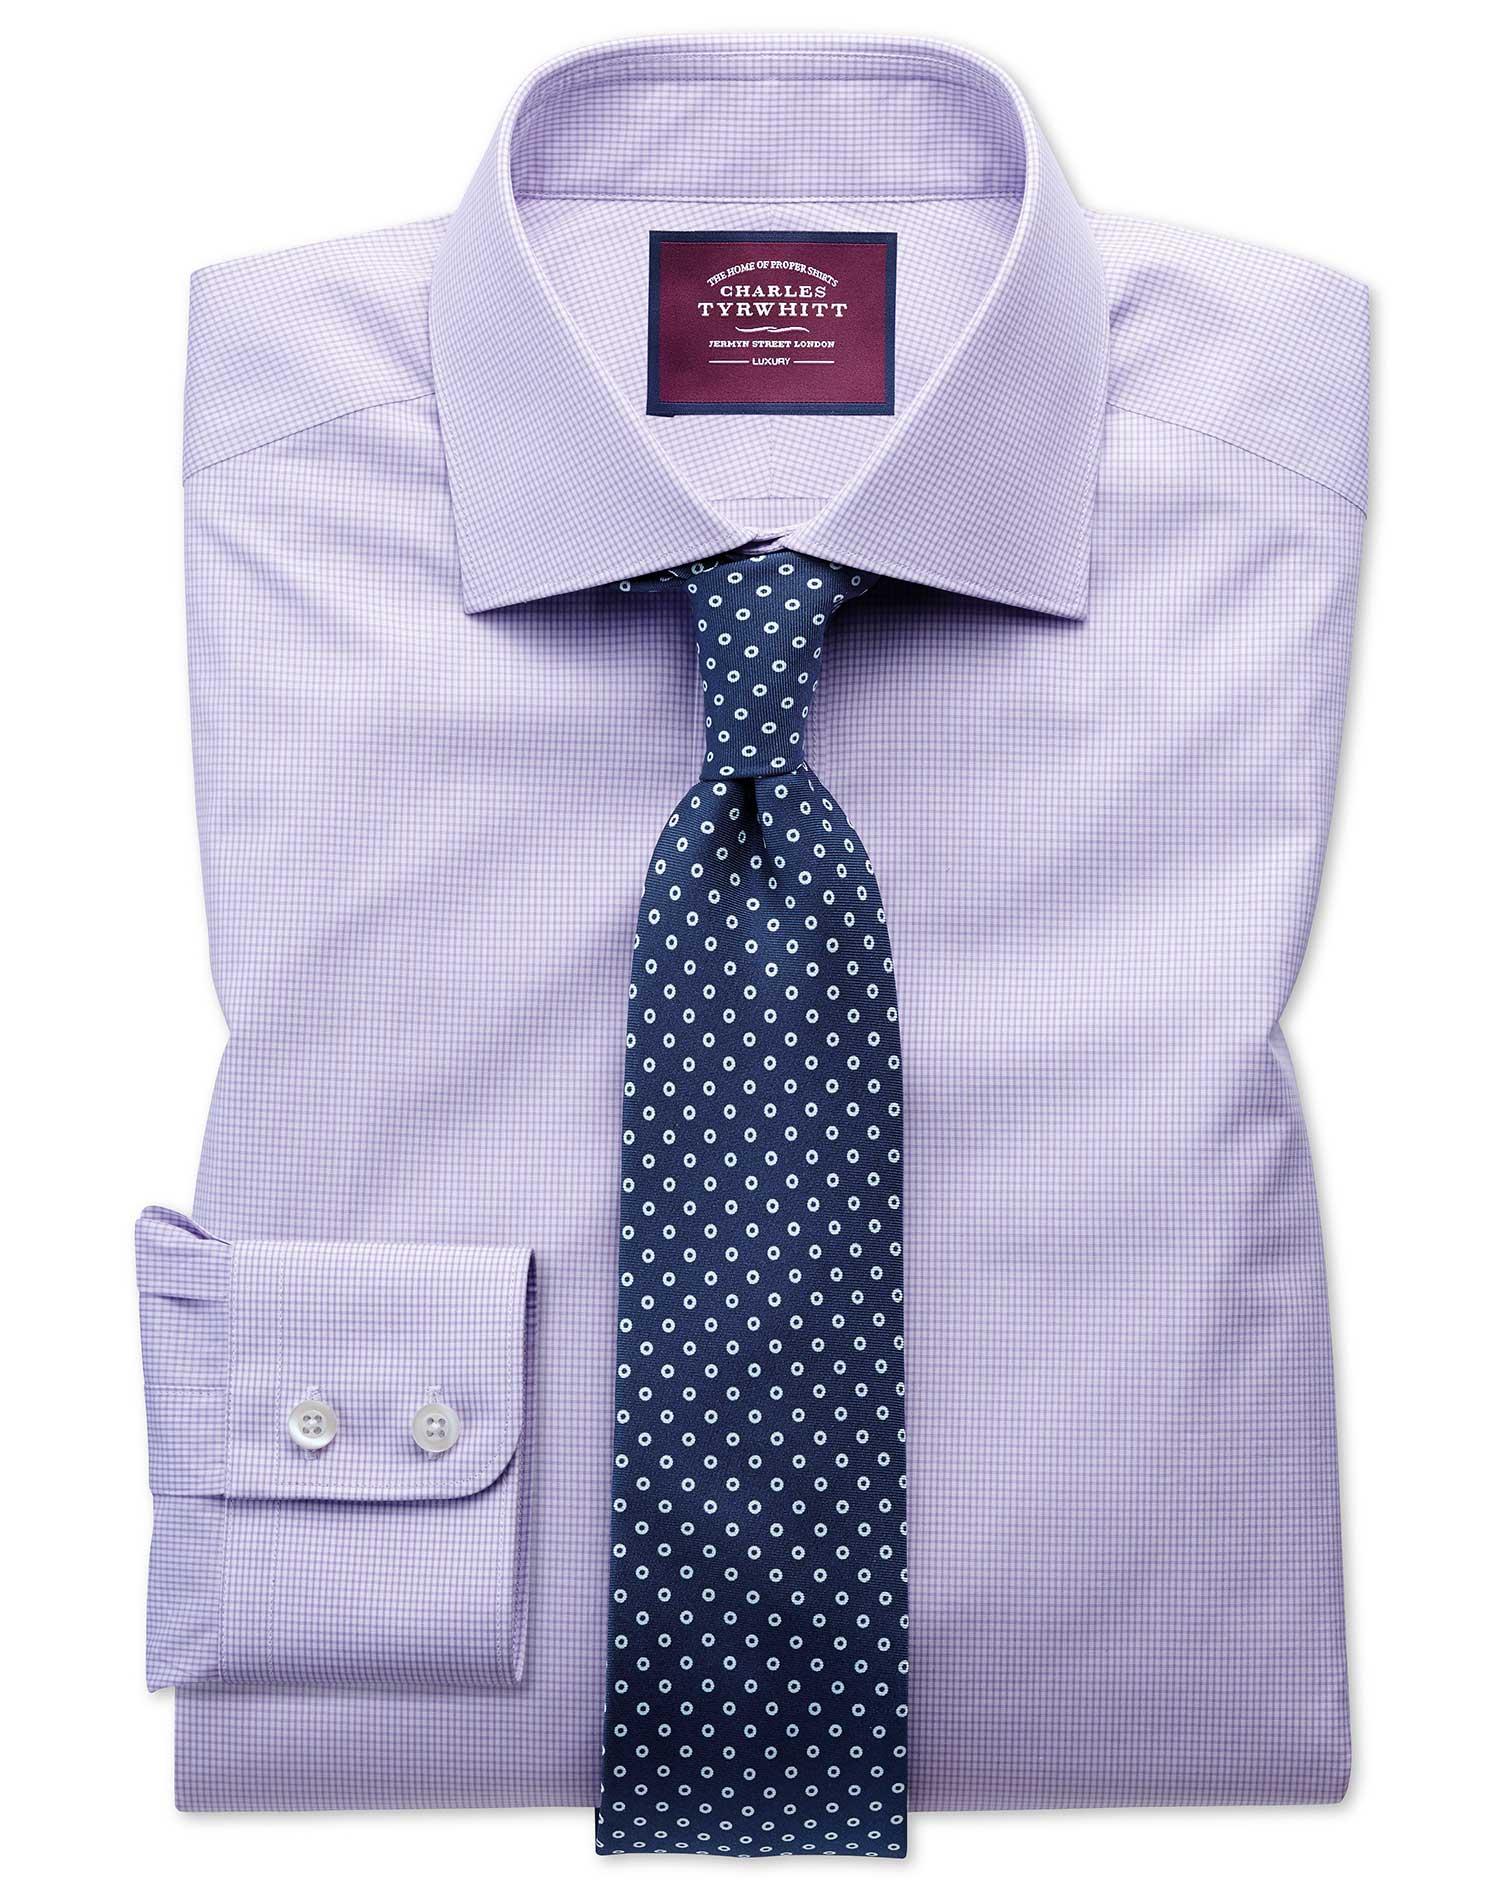 Classic Fit Semi-Cutaway Luxury Poplin Lilac and White Egyptian Cotton Formal Shirt Single Cuff Size